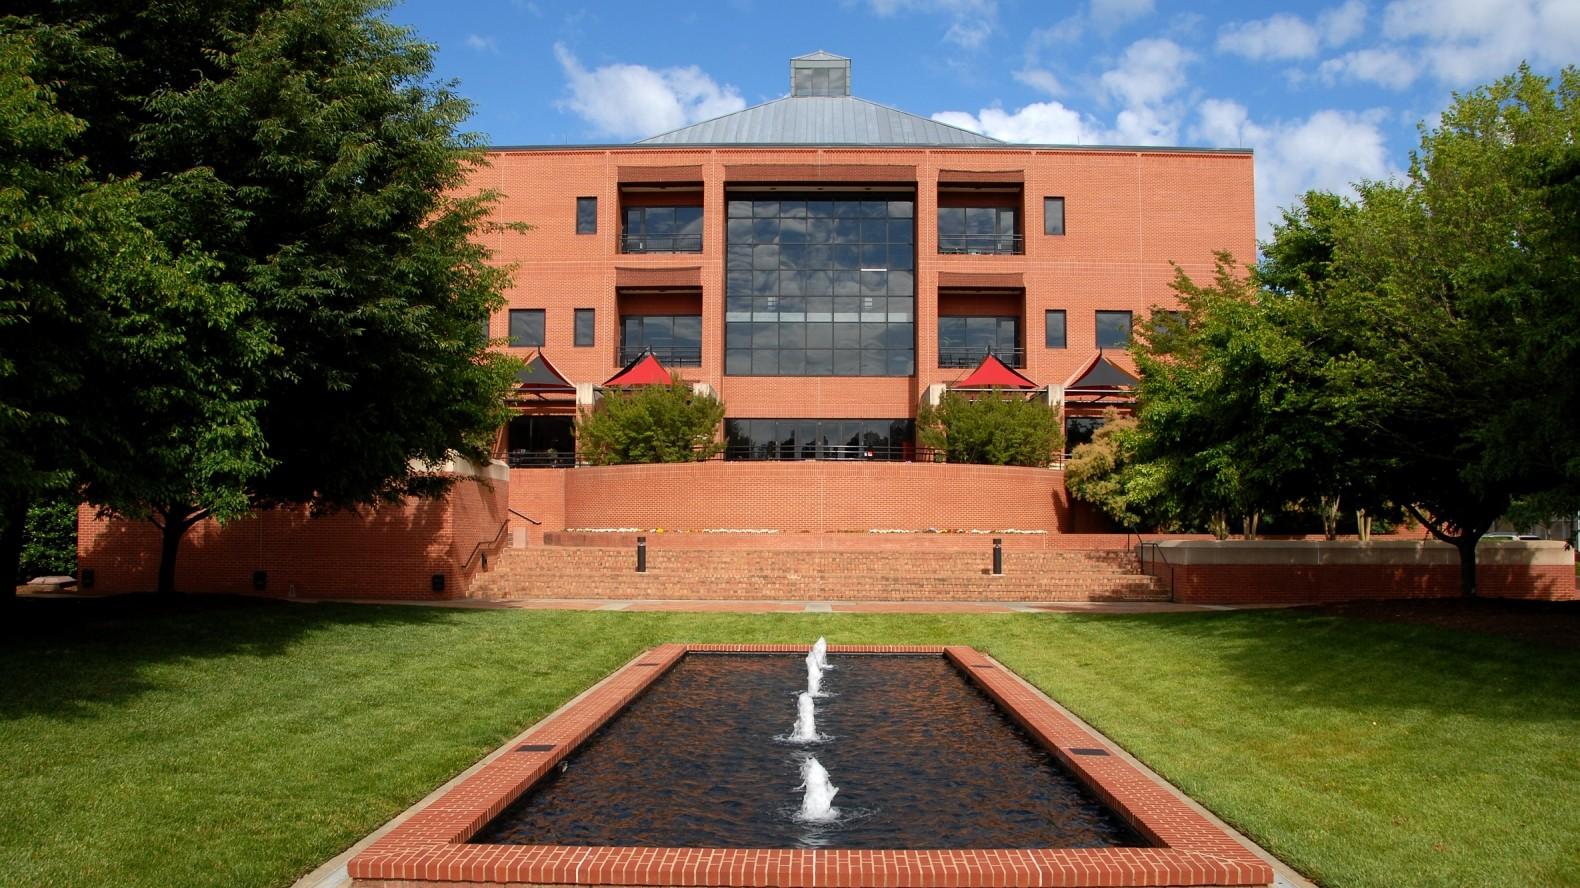 College of Textiles